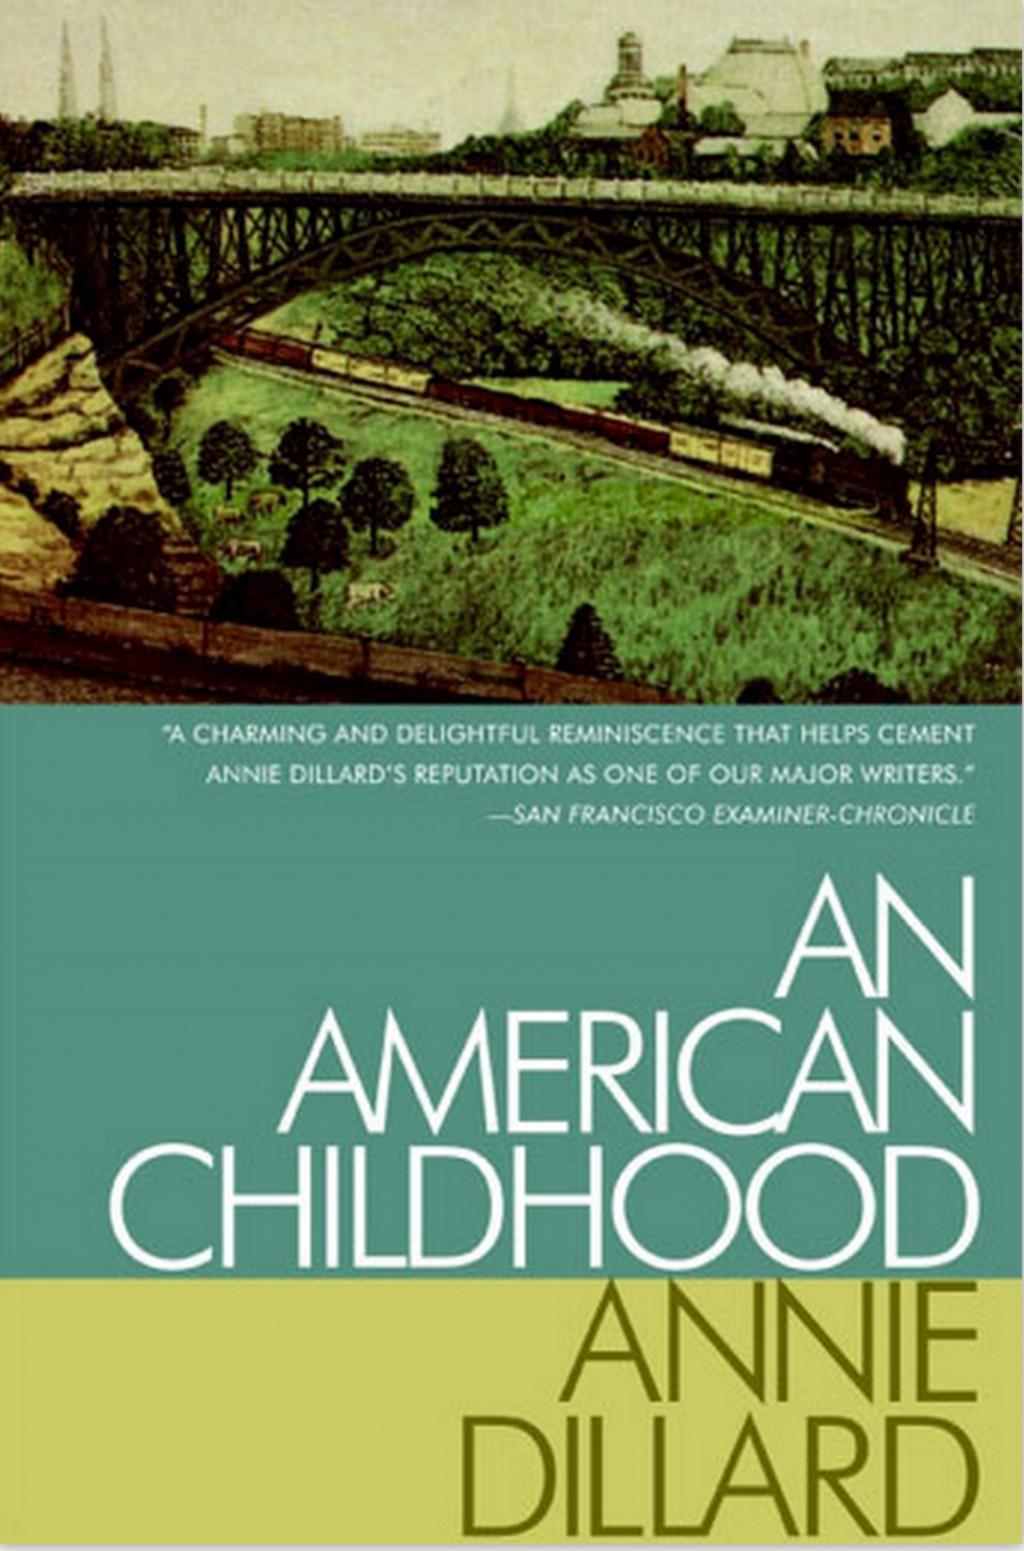 012 Annie Dillard An American Childhood Essays Essay Stirring Stunt Pilot Pdf Large